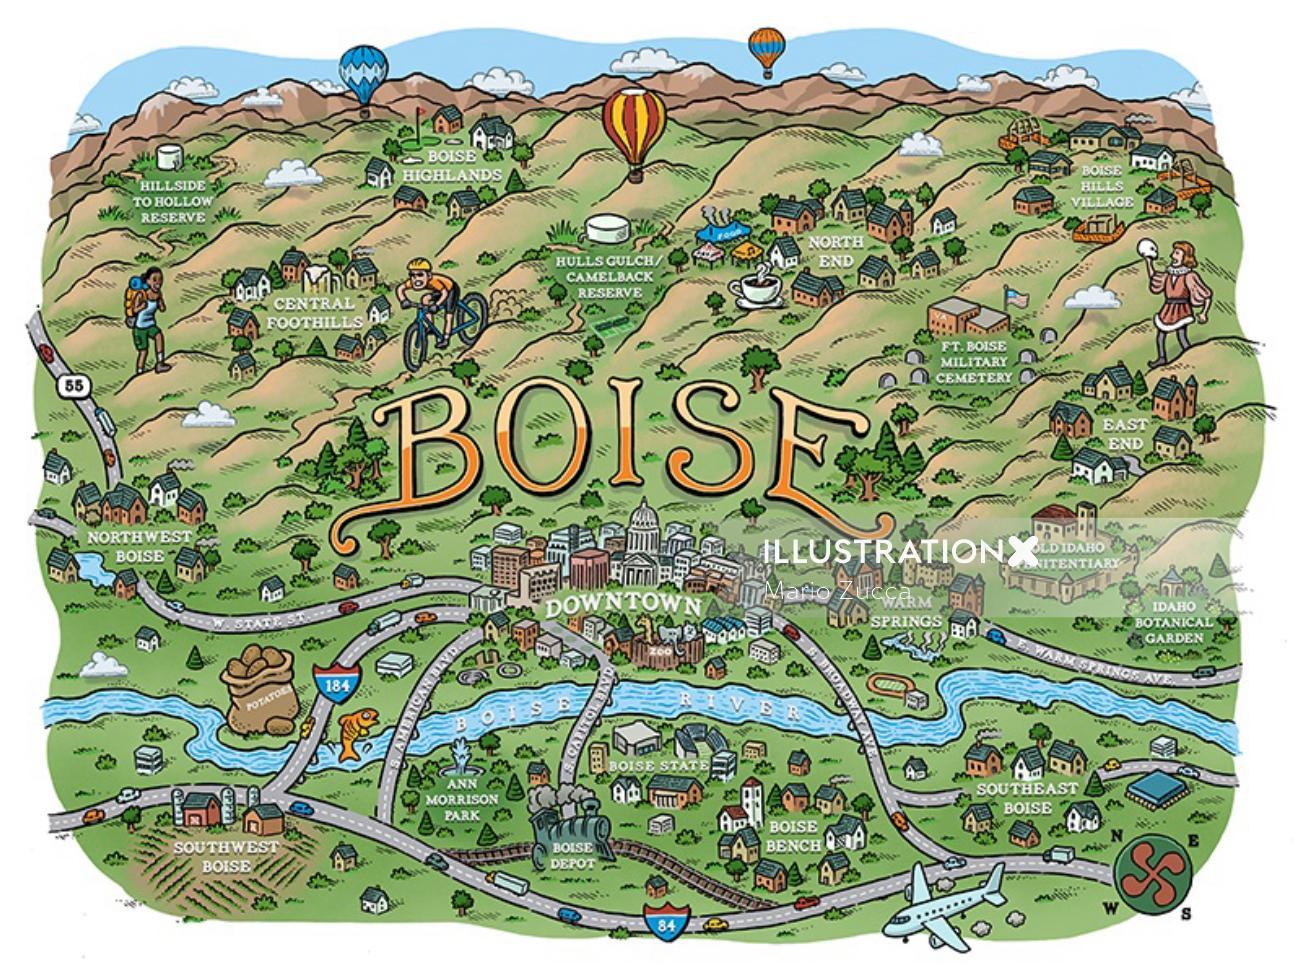 Boise city map Illustration